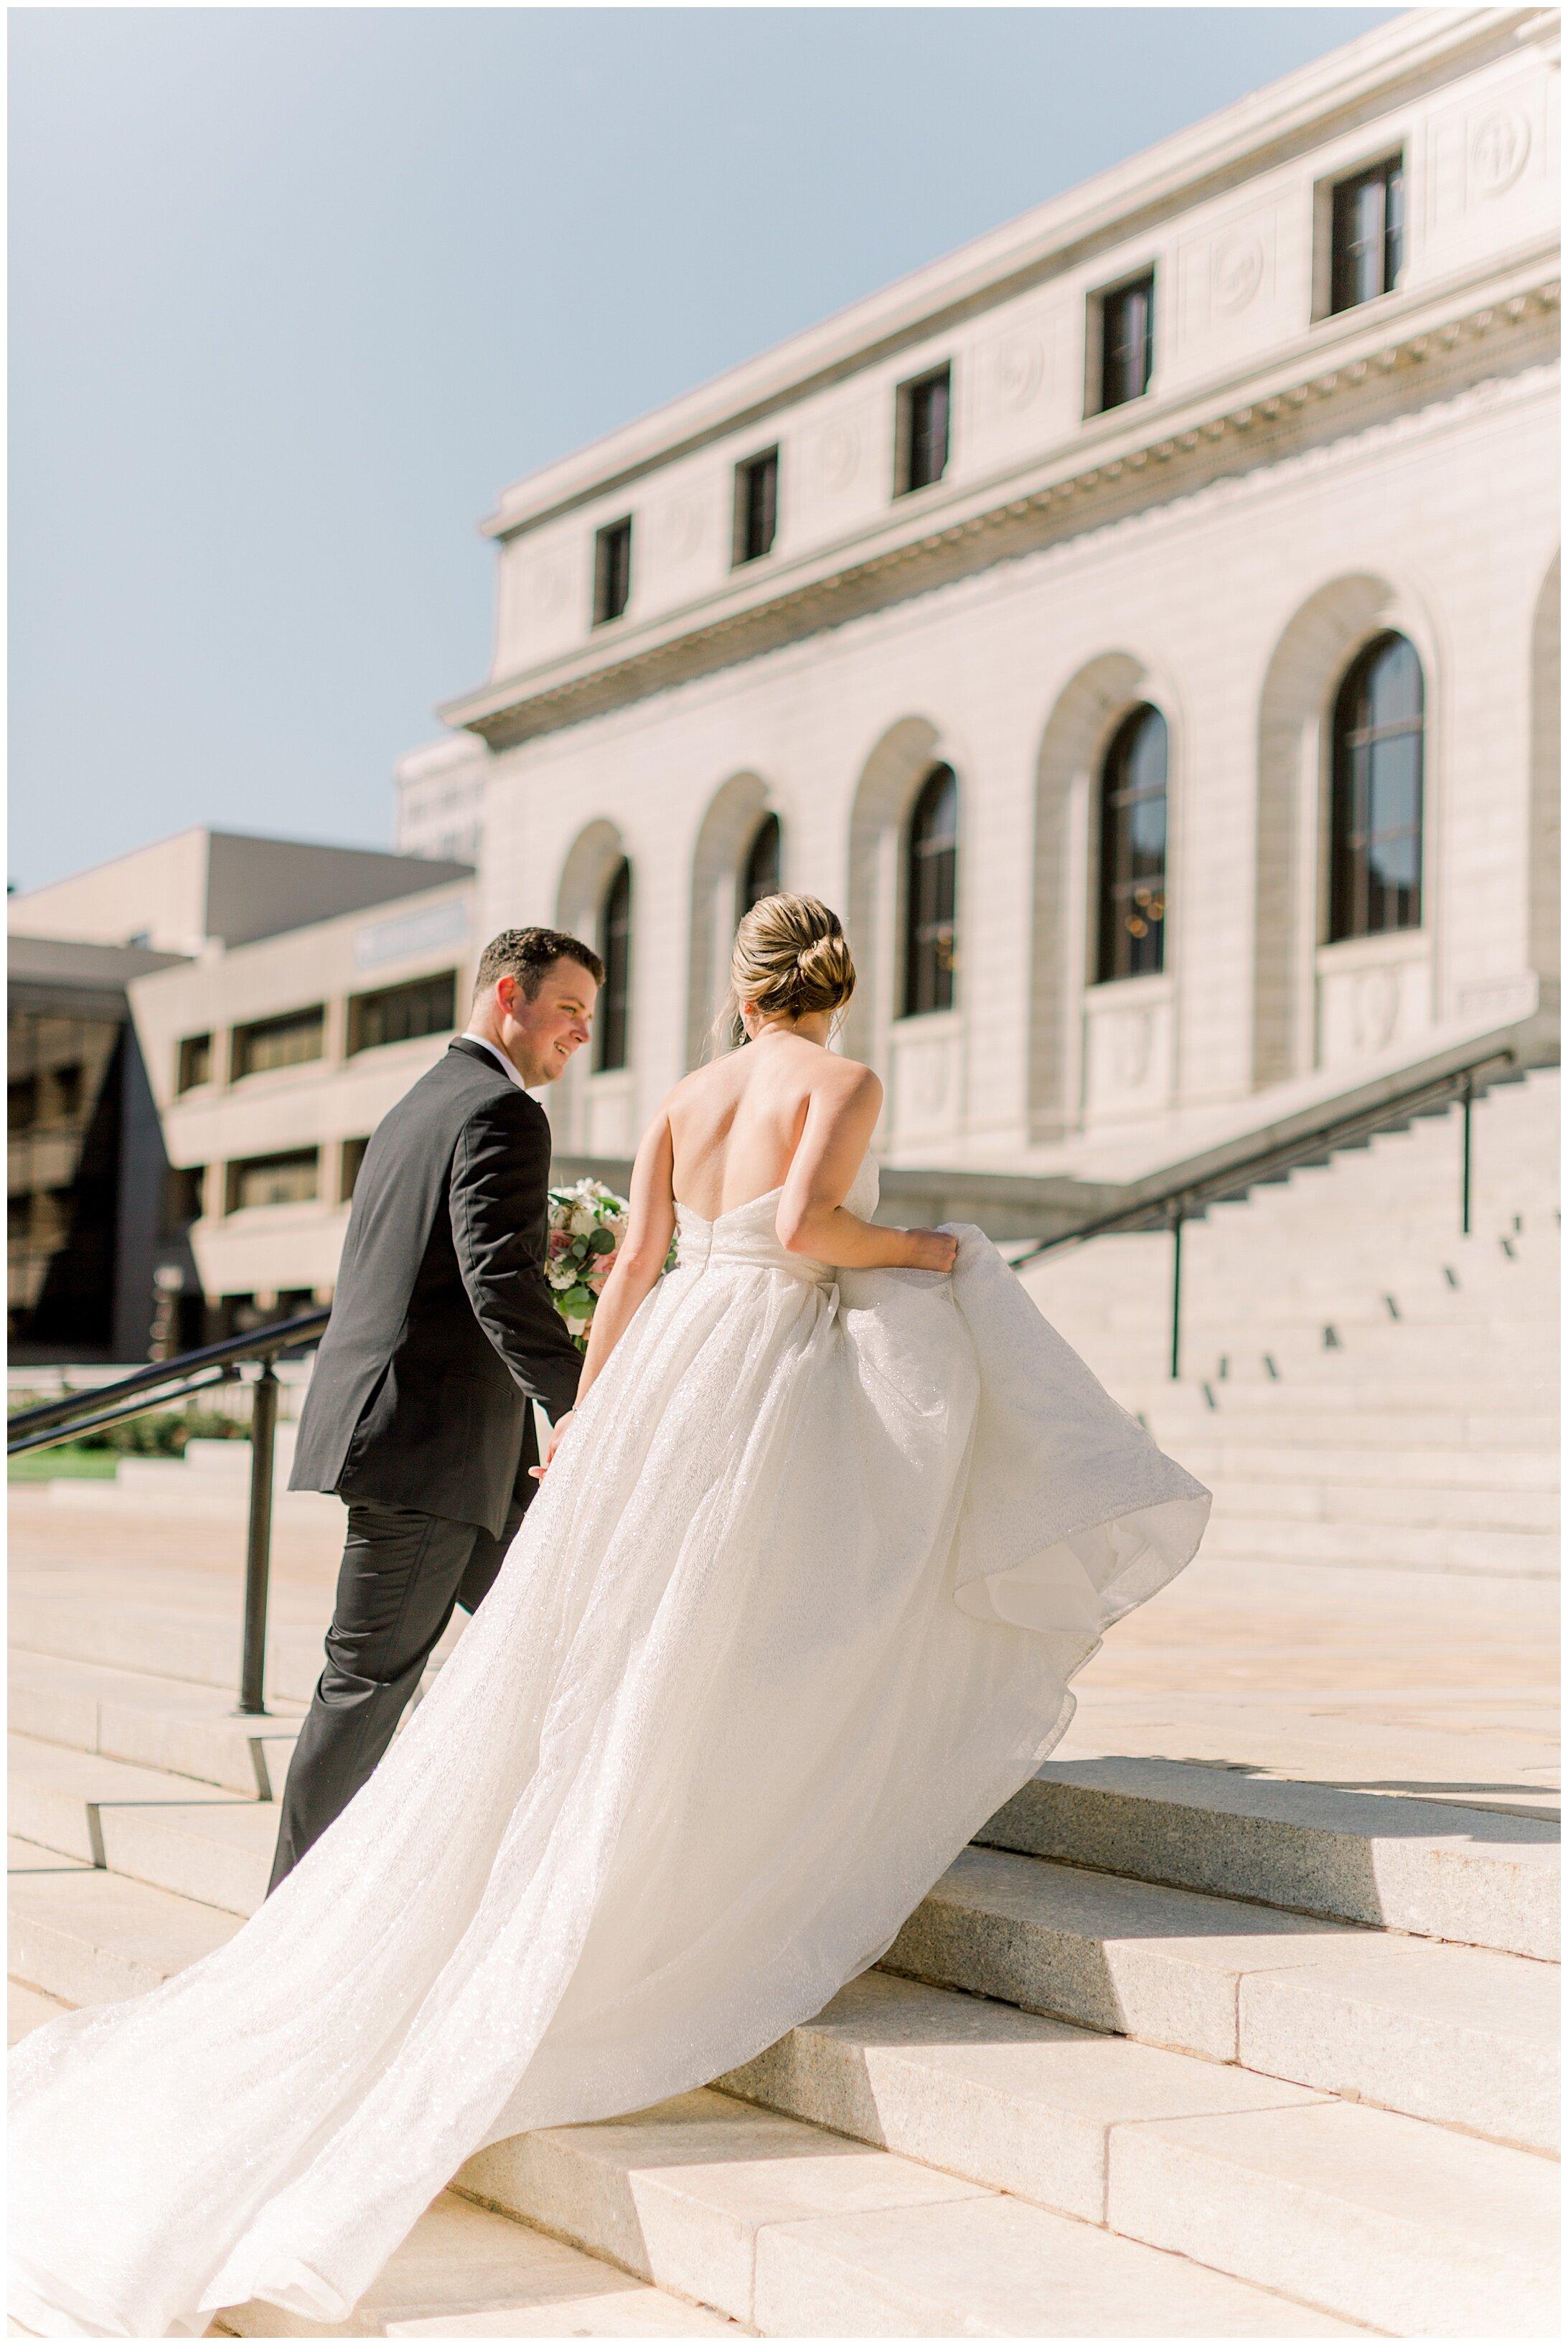 Marriott Grand Hotel Wedding - Ryan+emily